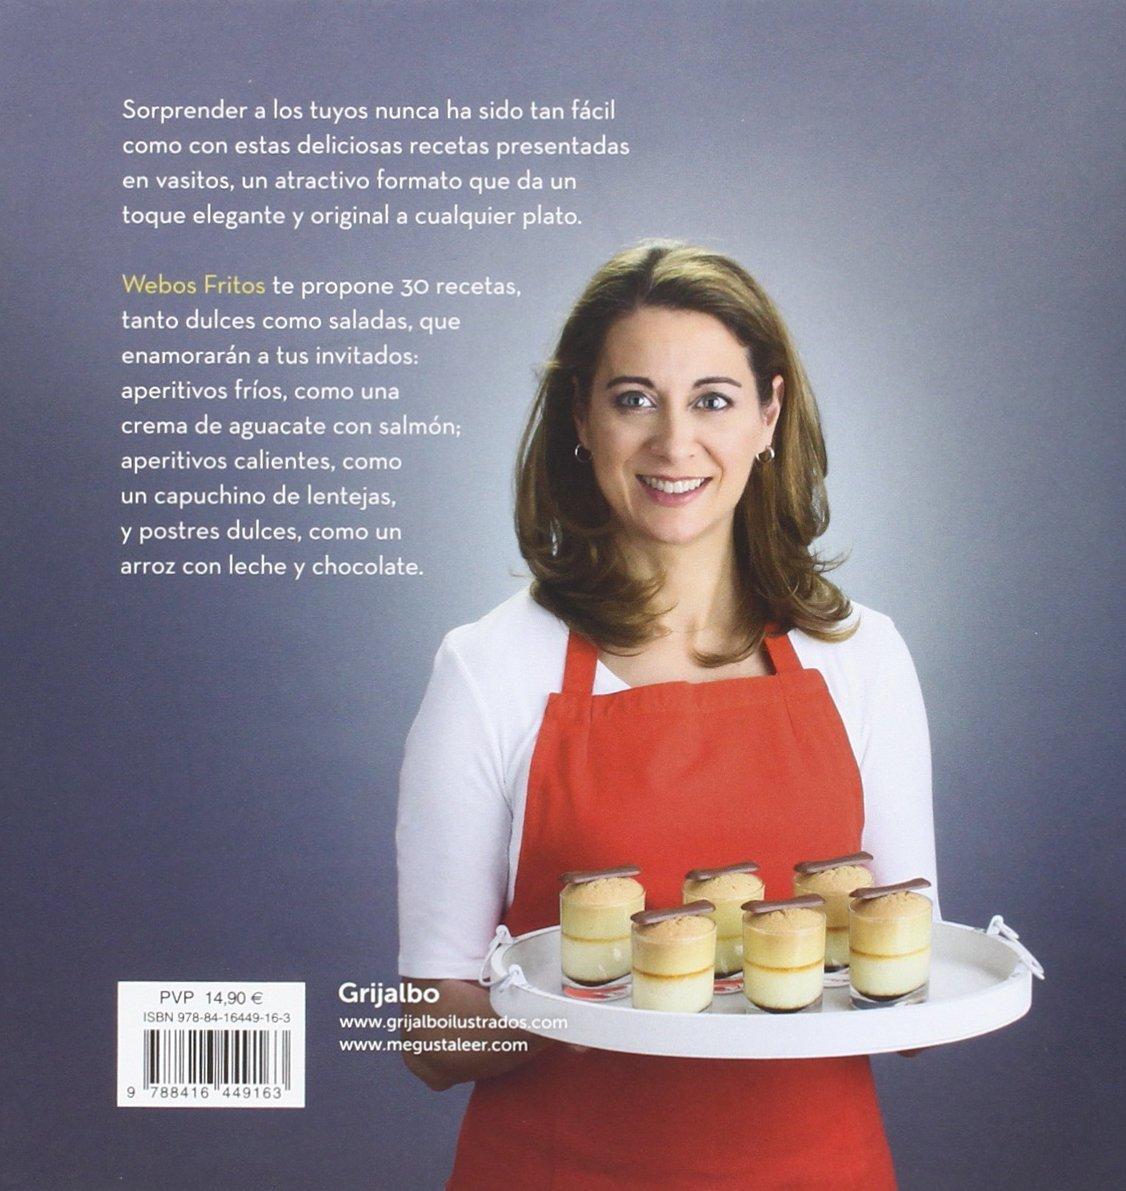 Vasitos -webos fritos- : recetas creativas, dulces y saladas: Jesús Cerezo, Susana Pérez: 9788416449163: Amazon.com: Books